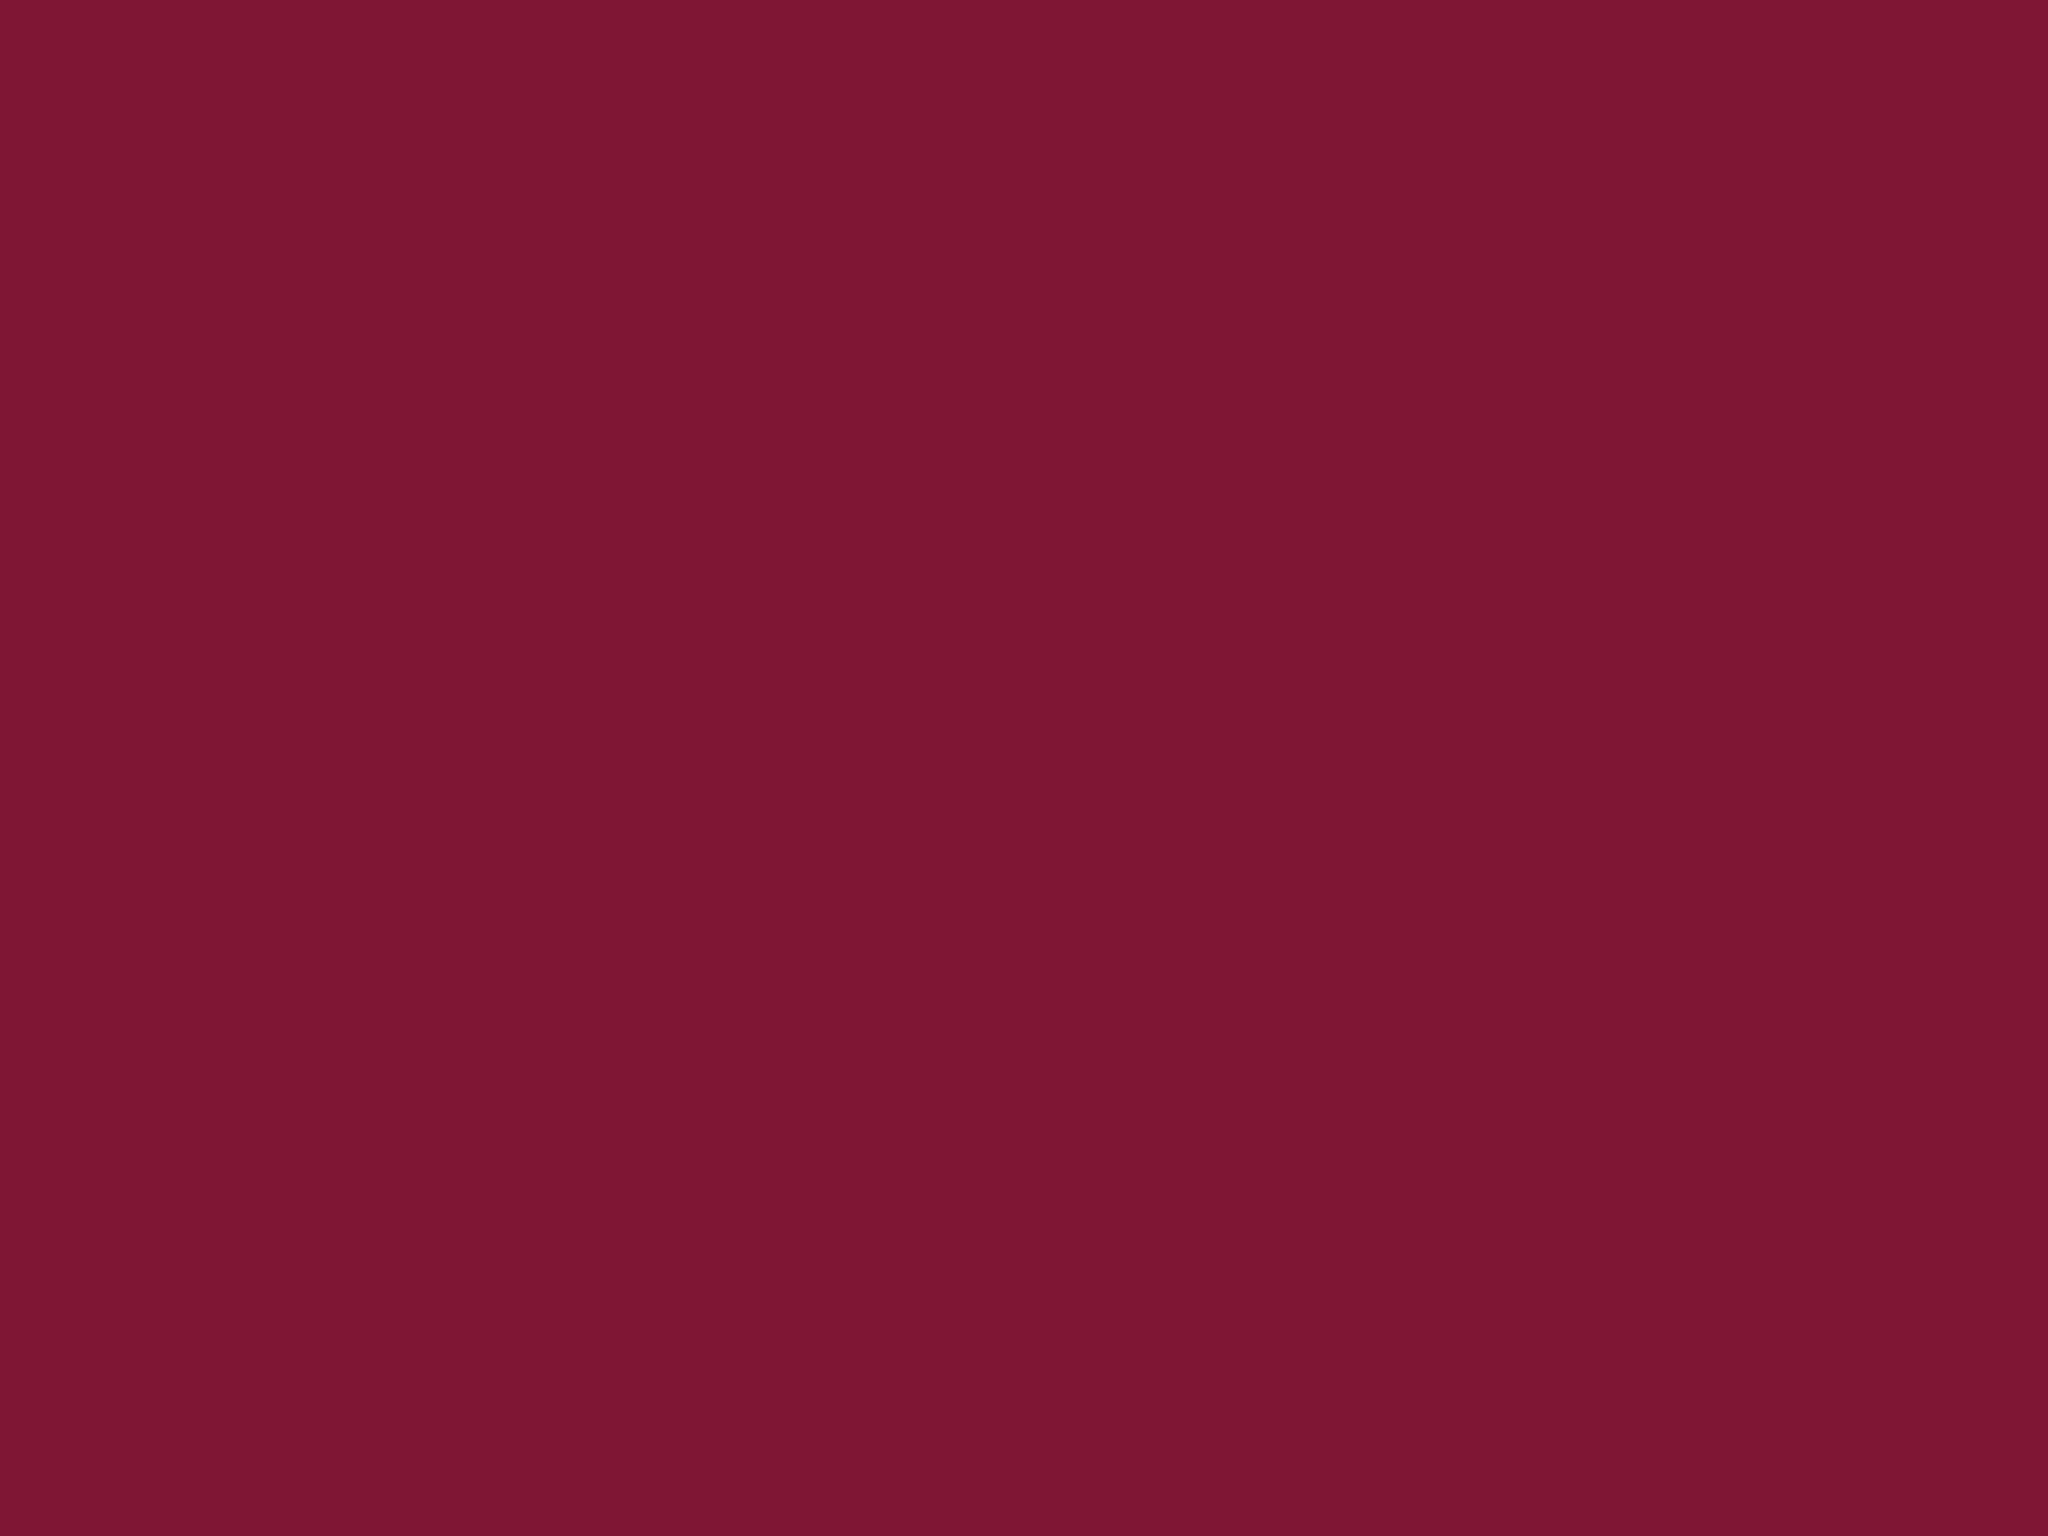 2048x1536 Claret Solid Color Background